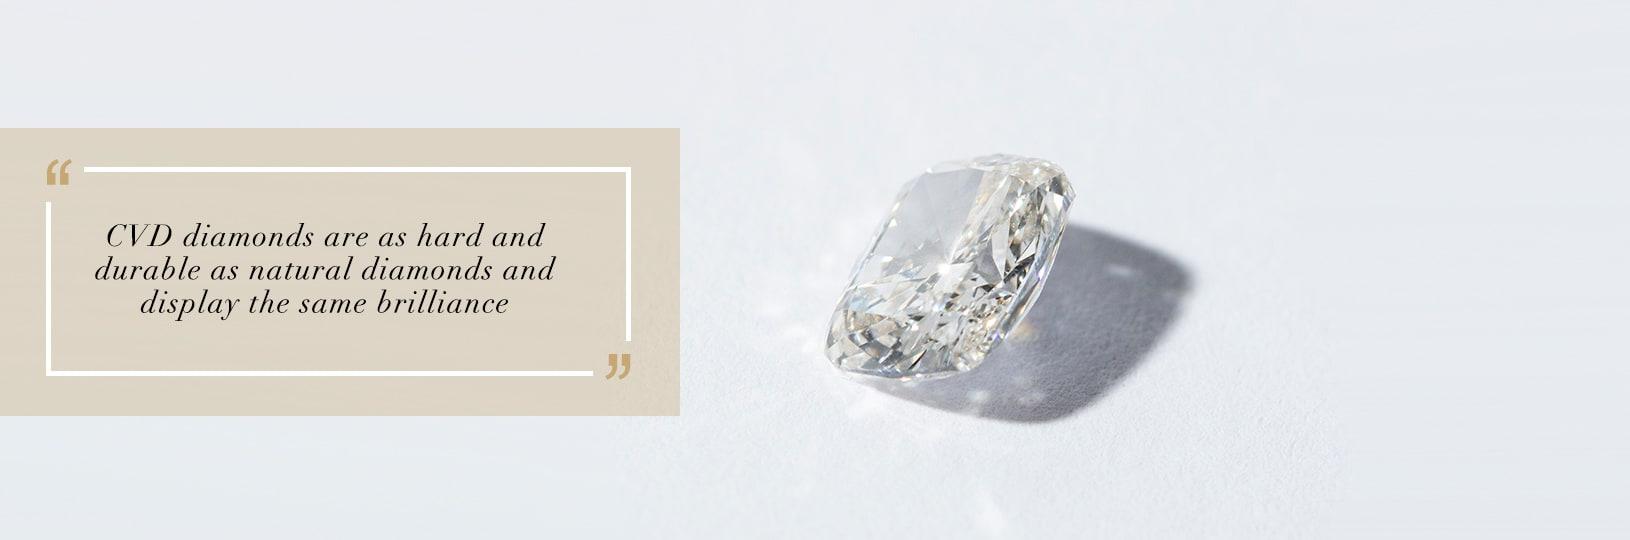 CVD diamonds are as durable as natural diamonds